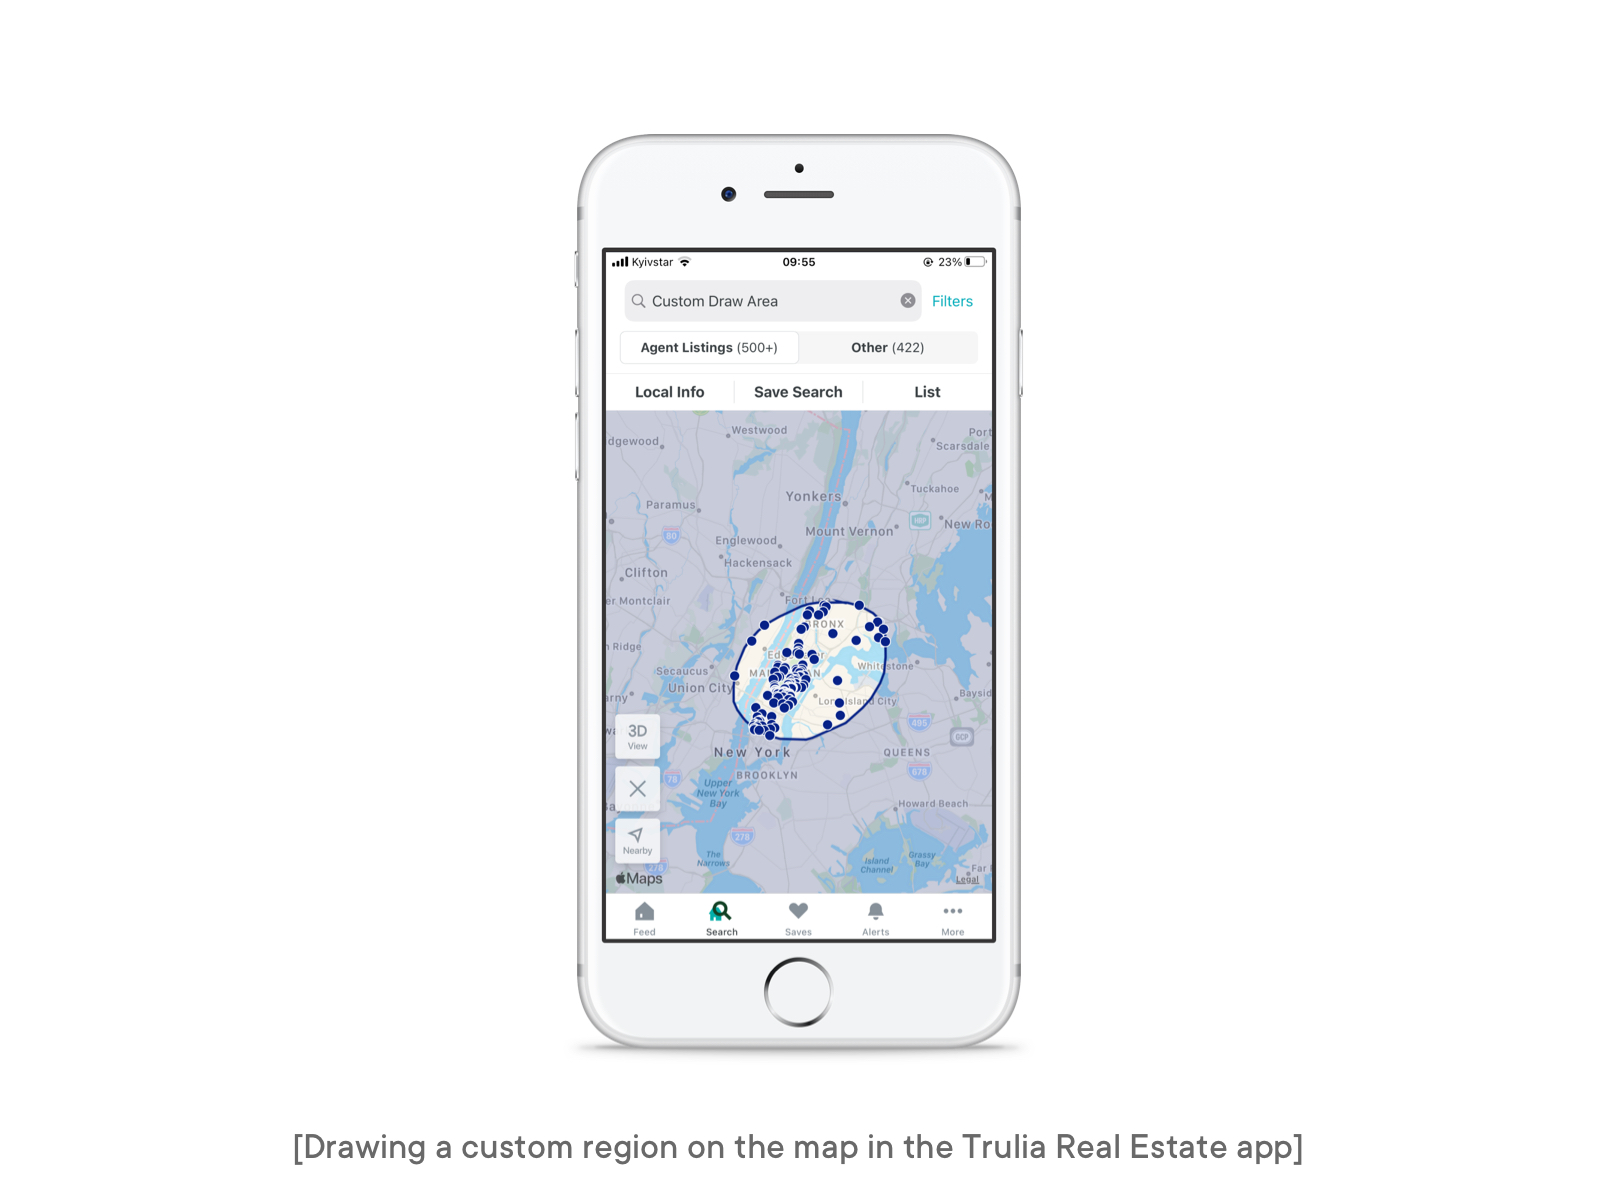 custom region in the trulia app